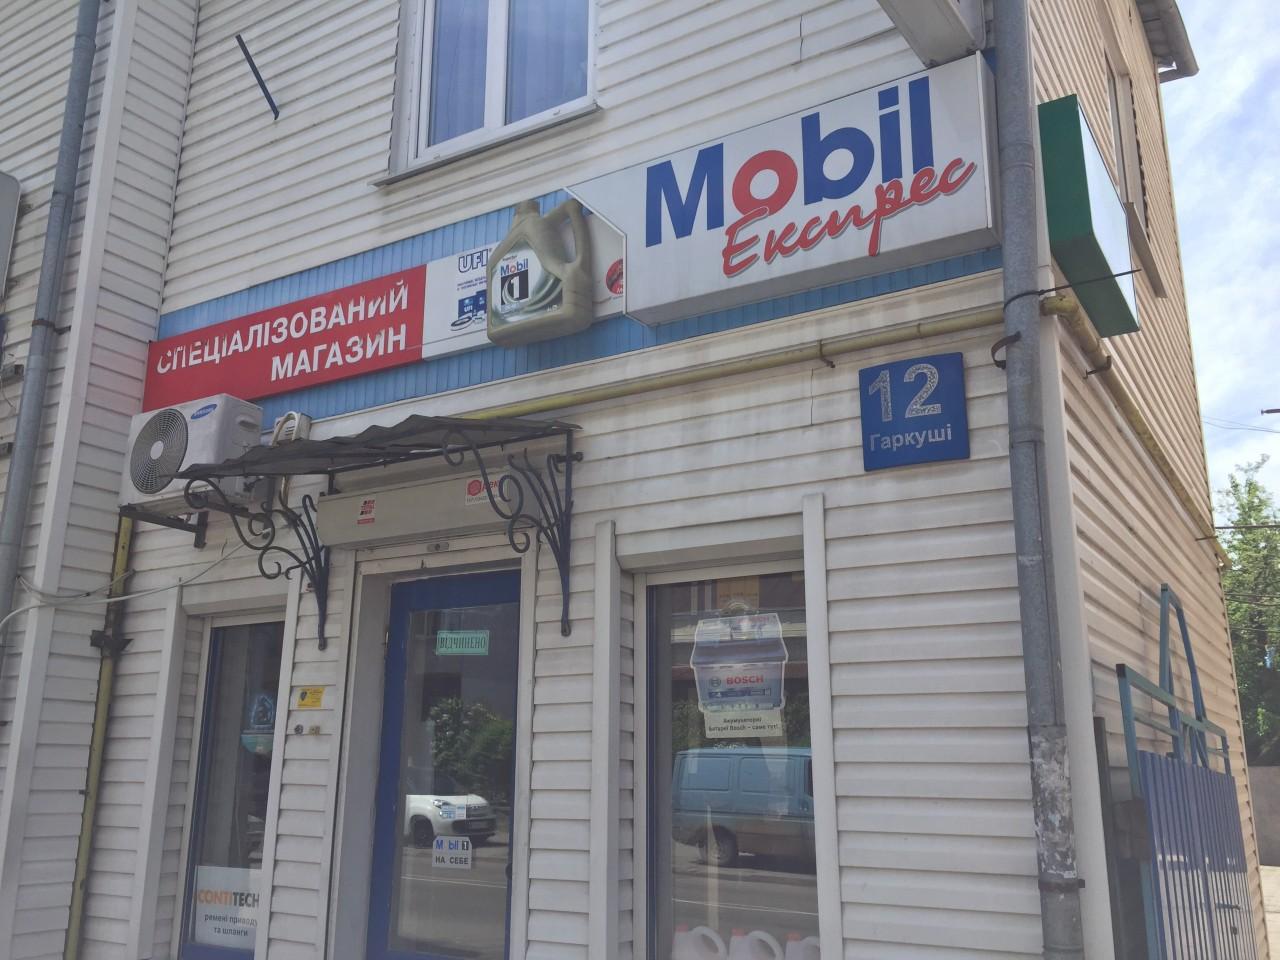 mobil-experess-1.jpg